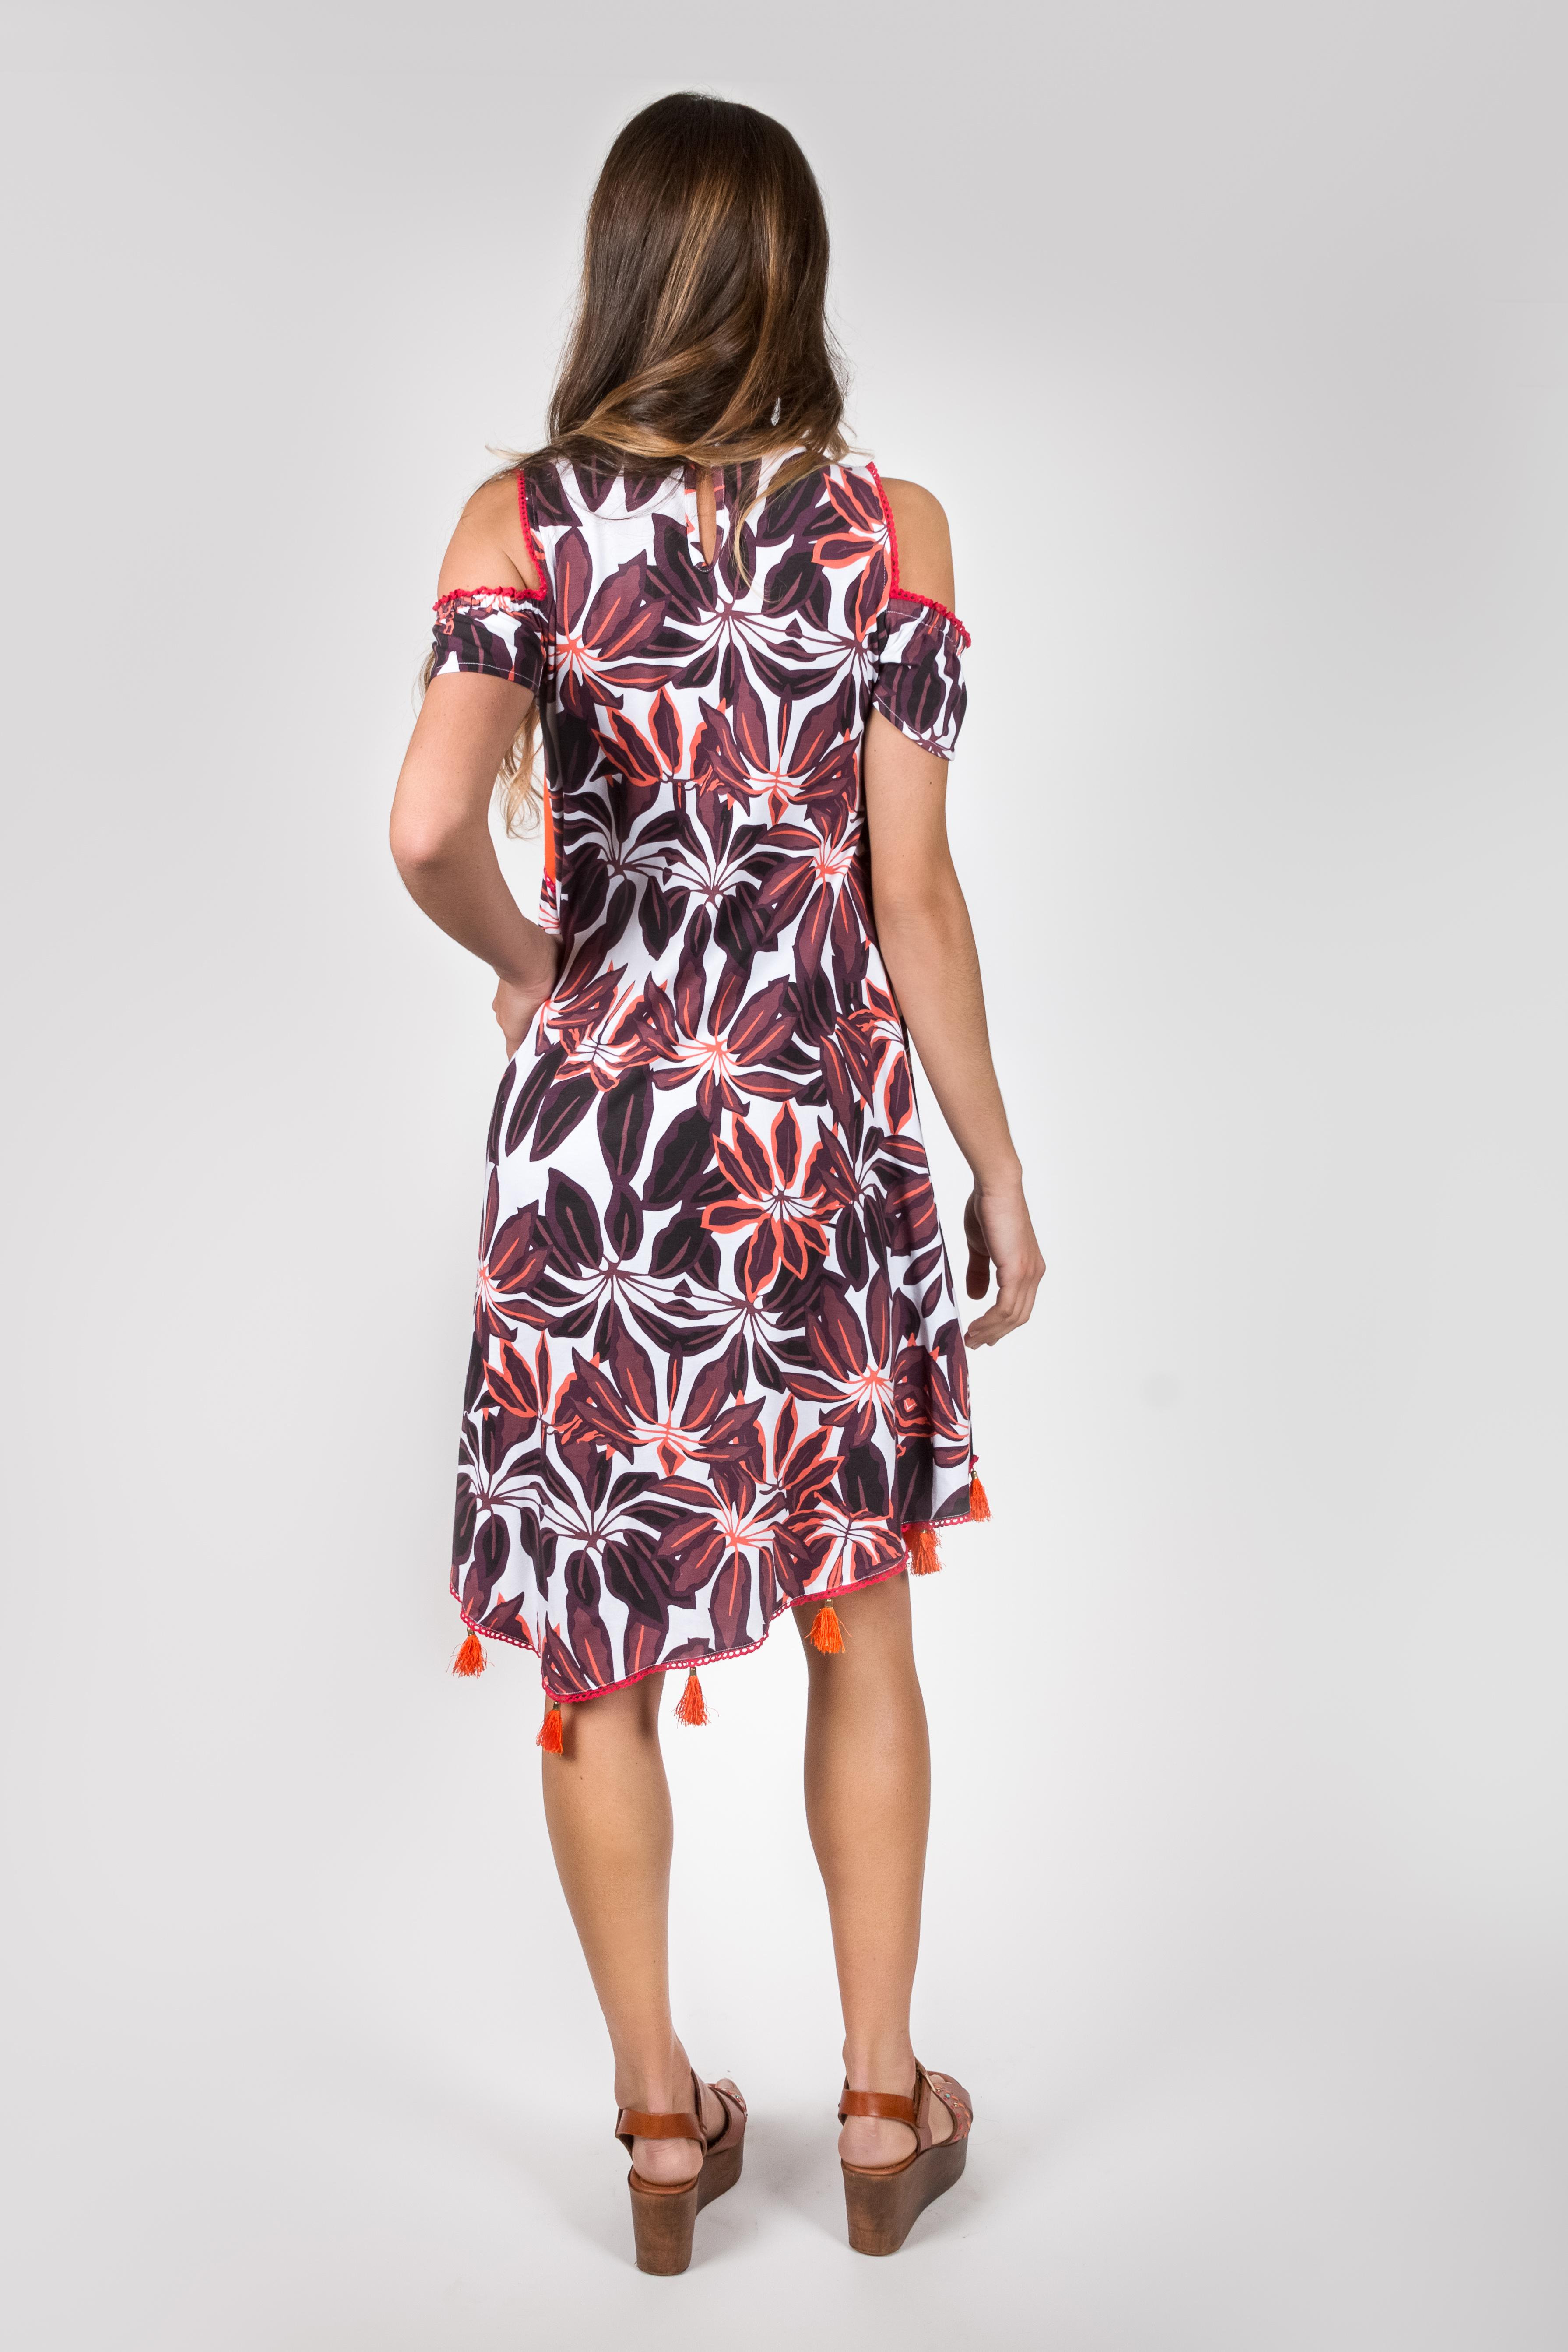 Shoklett Spain: Orange Hibiscus Cold Shoulder Samantha Midi Dress